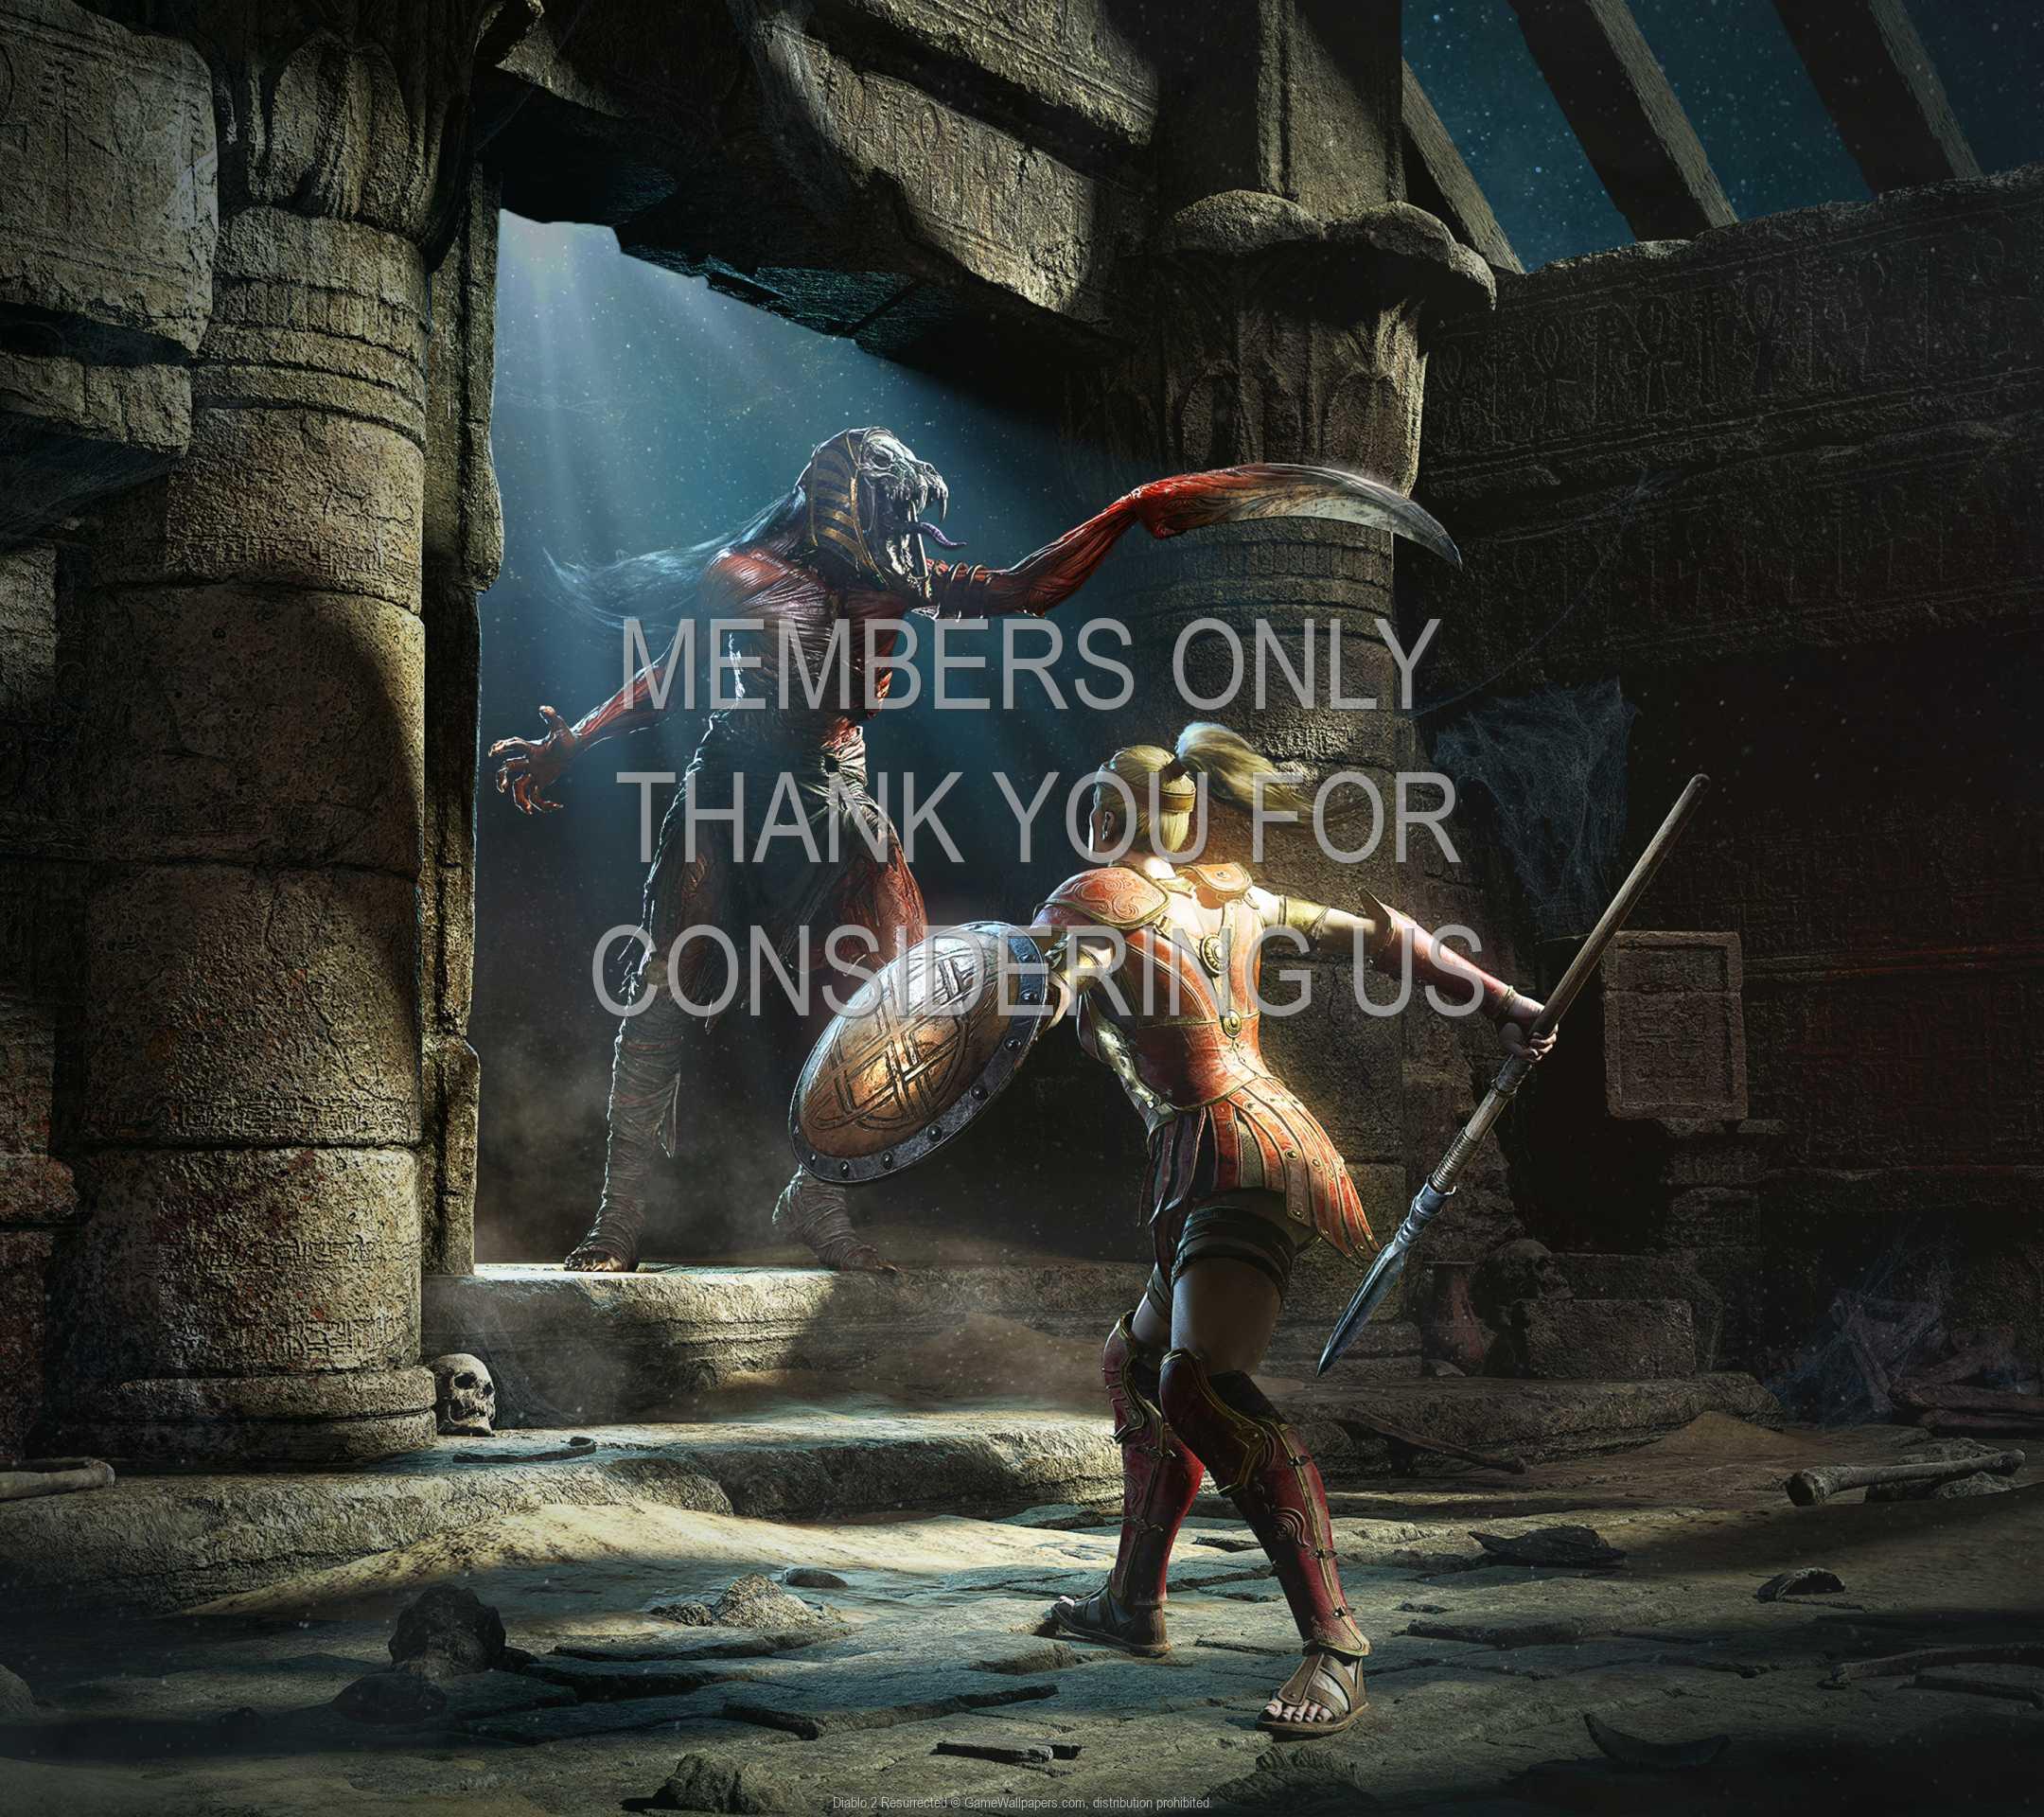 Diablo 2: Resurrected 1080p Horizontal Mobile wallpaper or background 08